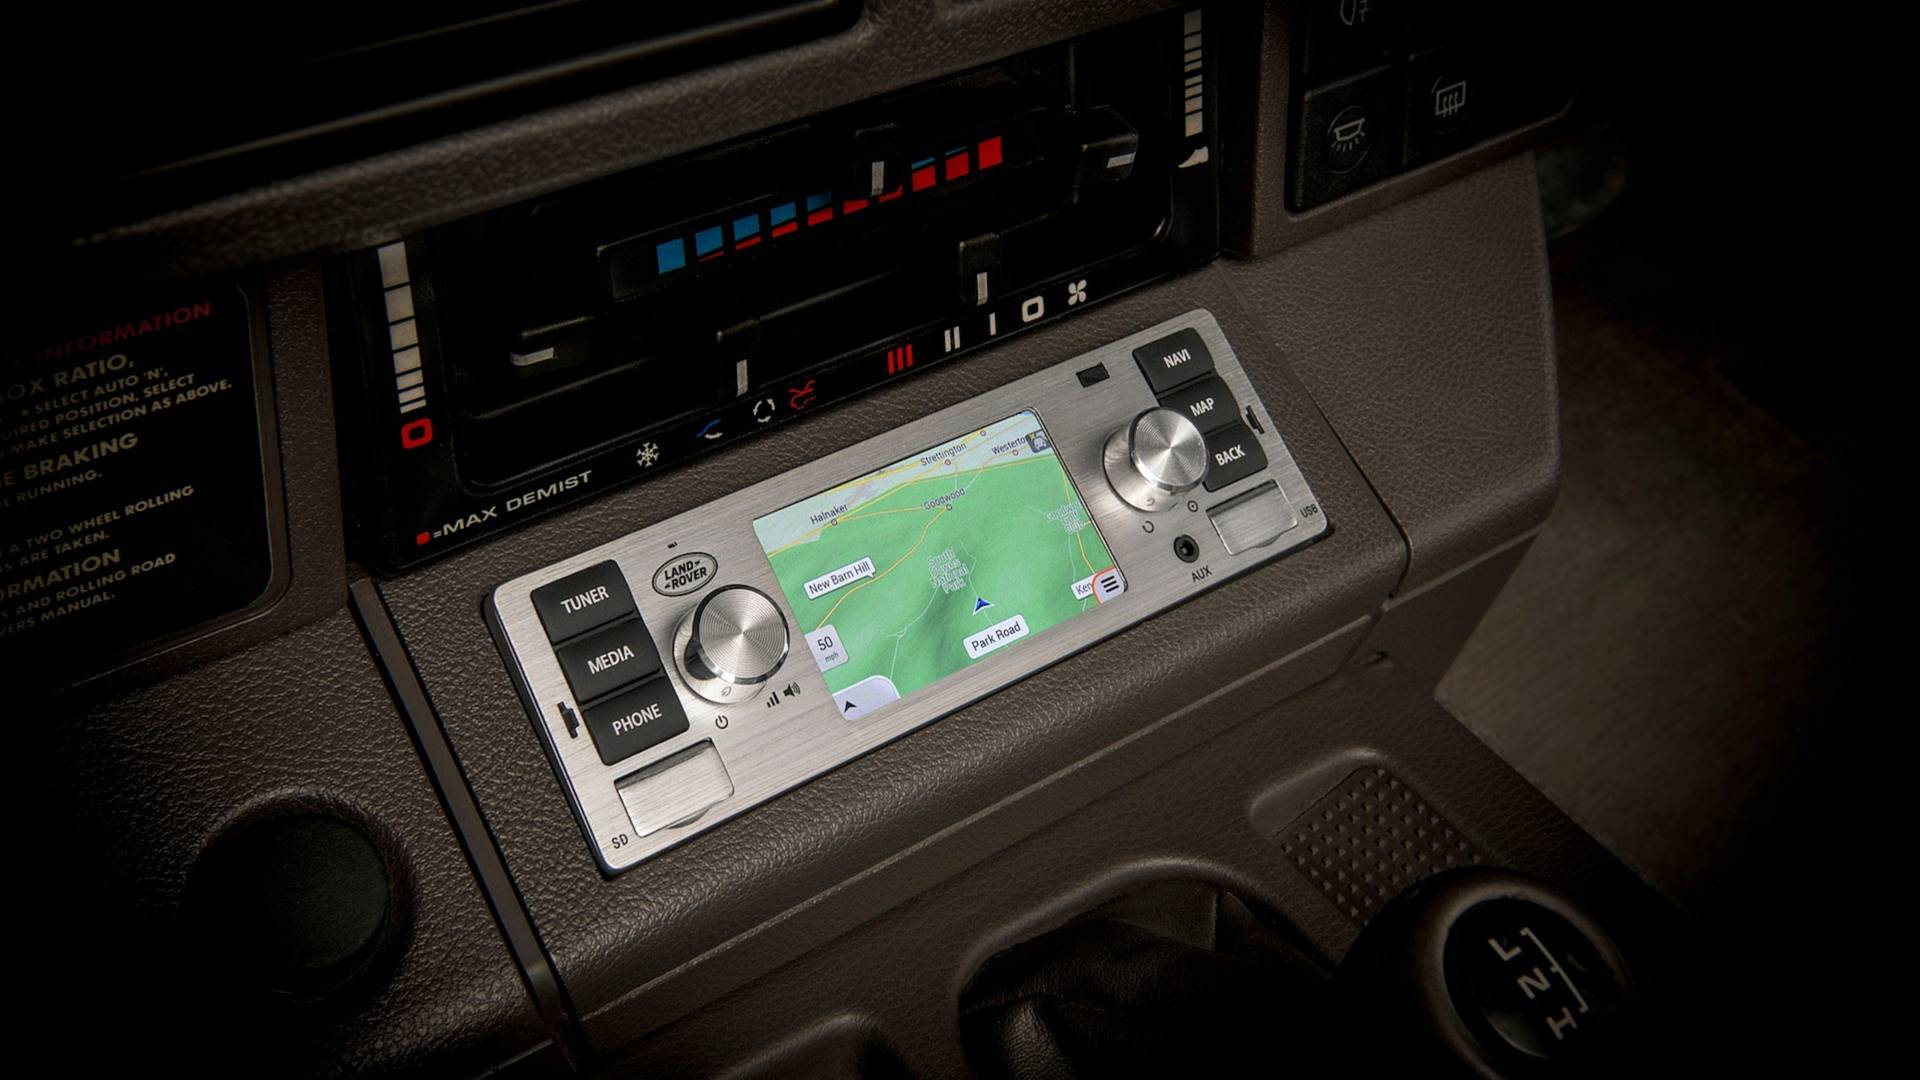 jaguar-land-rover-classic-infotainment-system